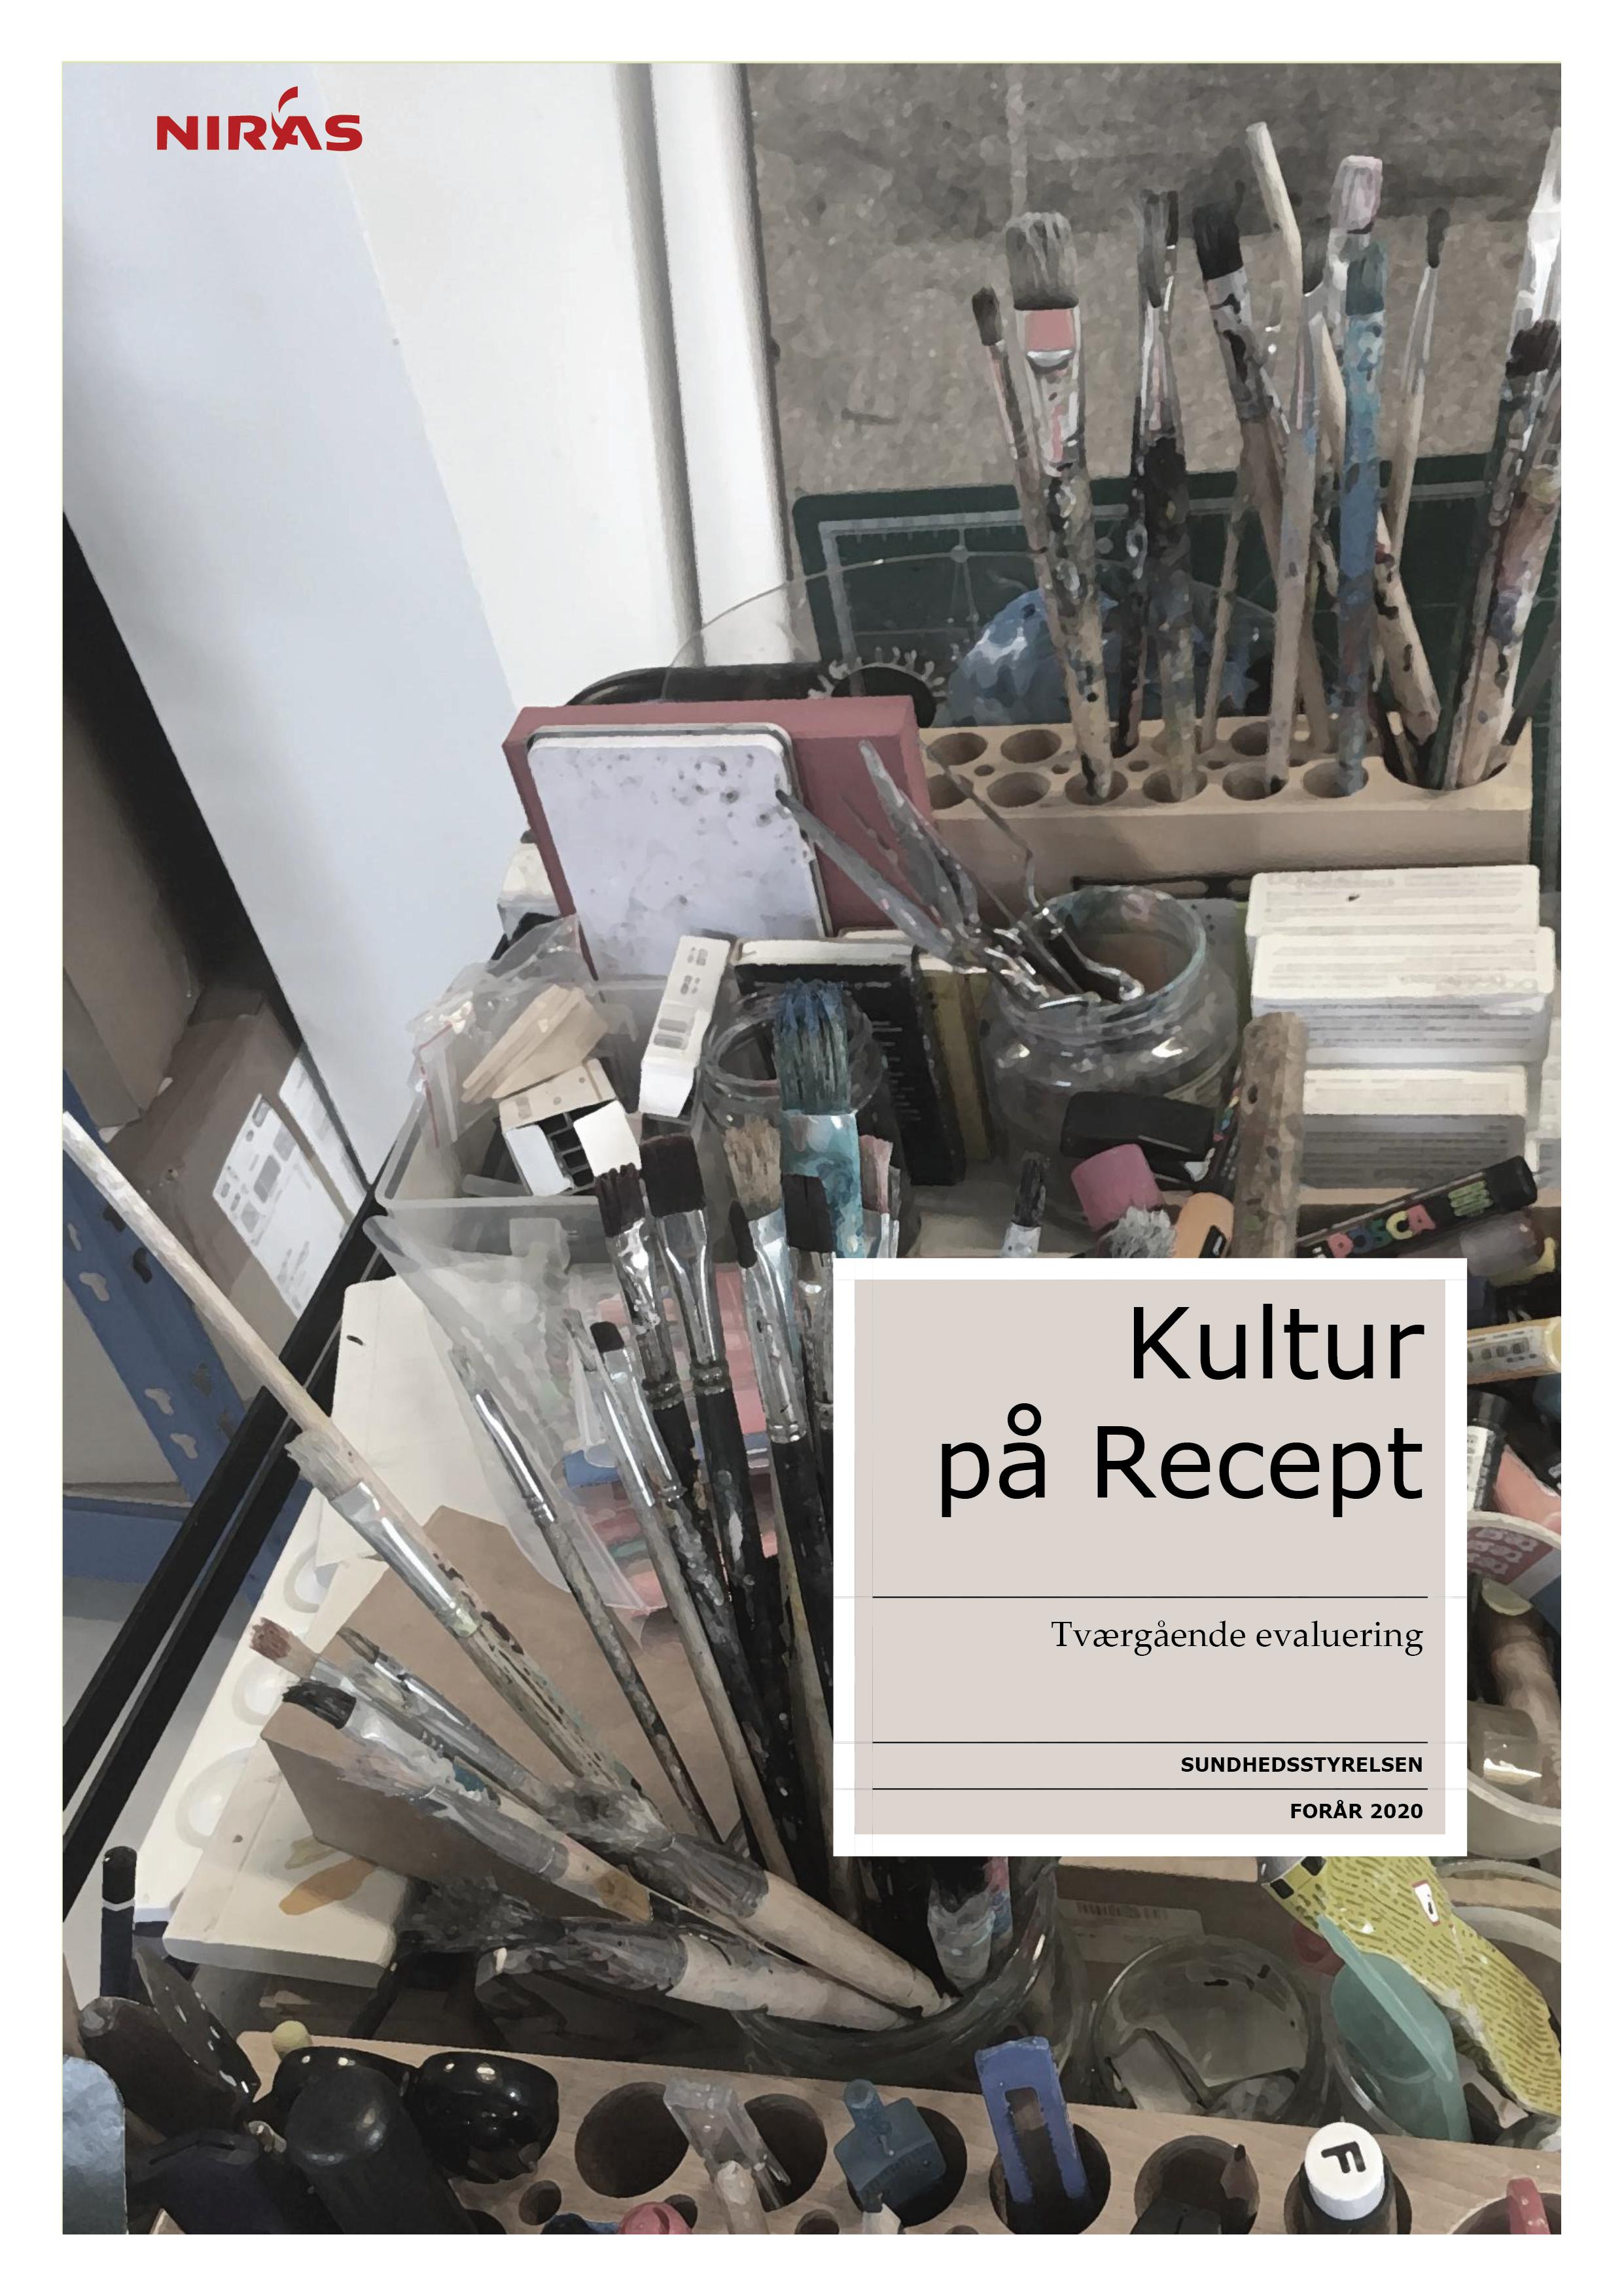 kulturpårecept_eva-01